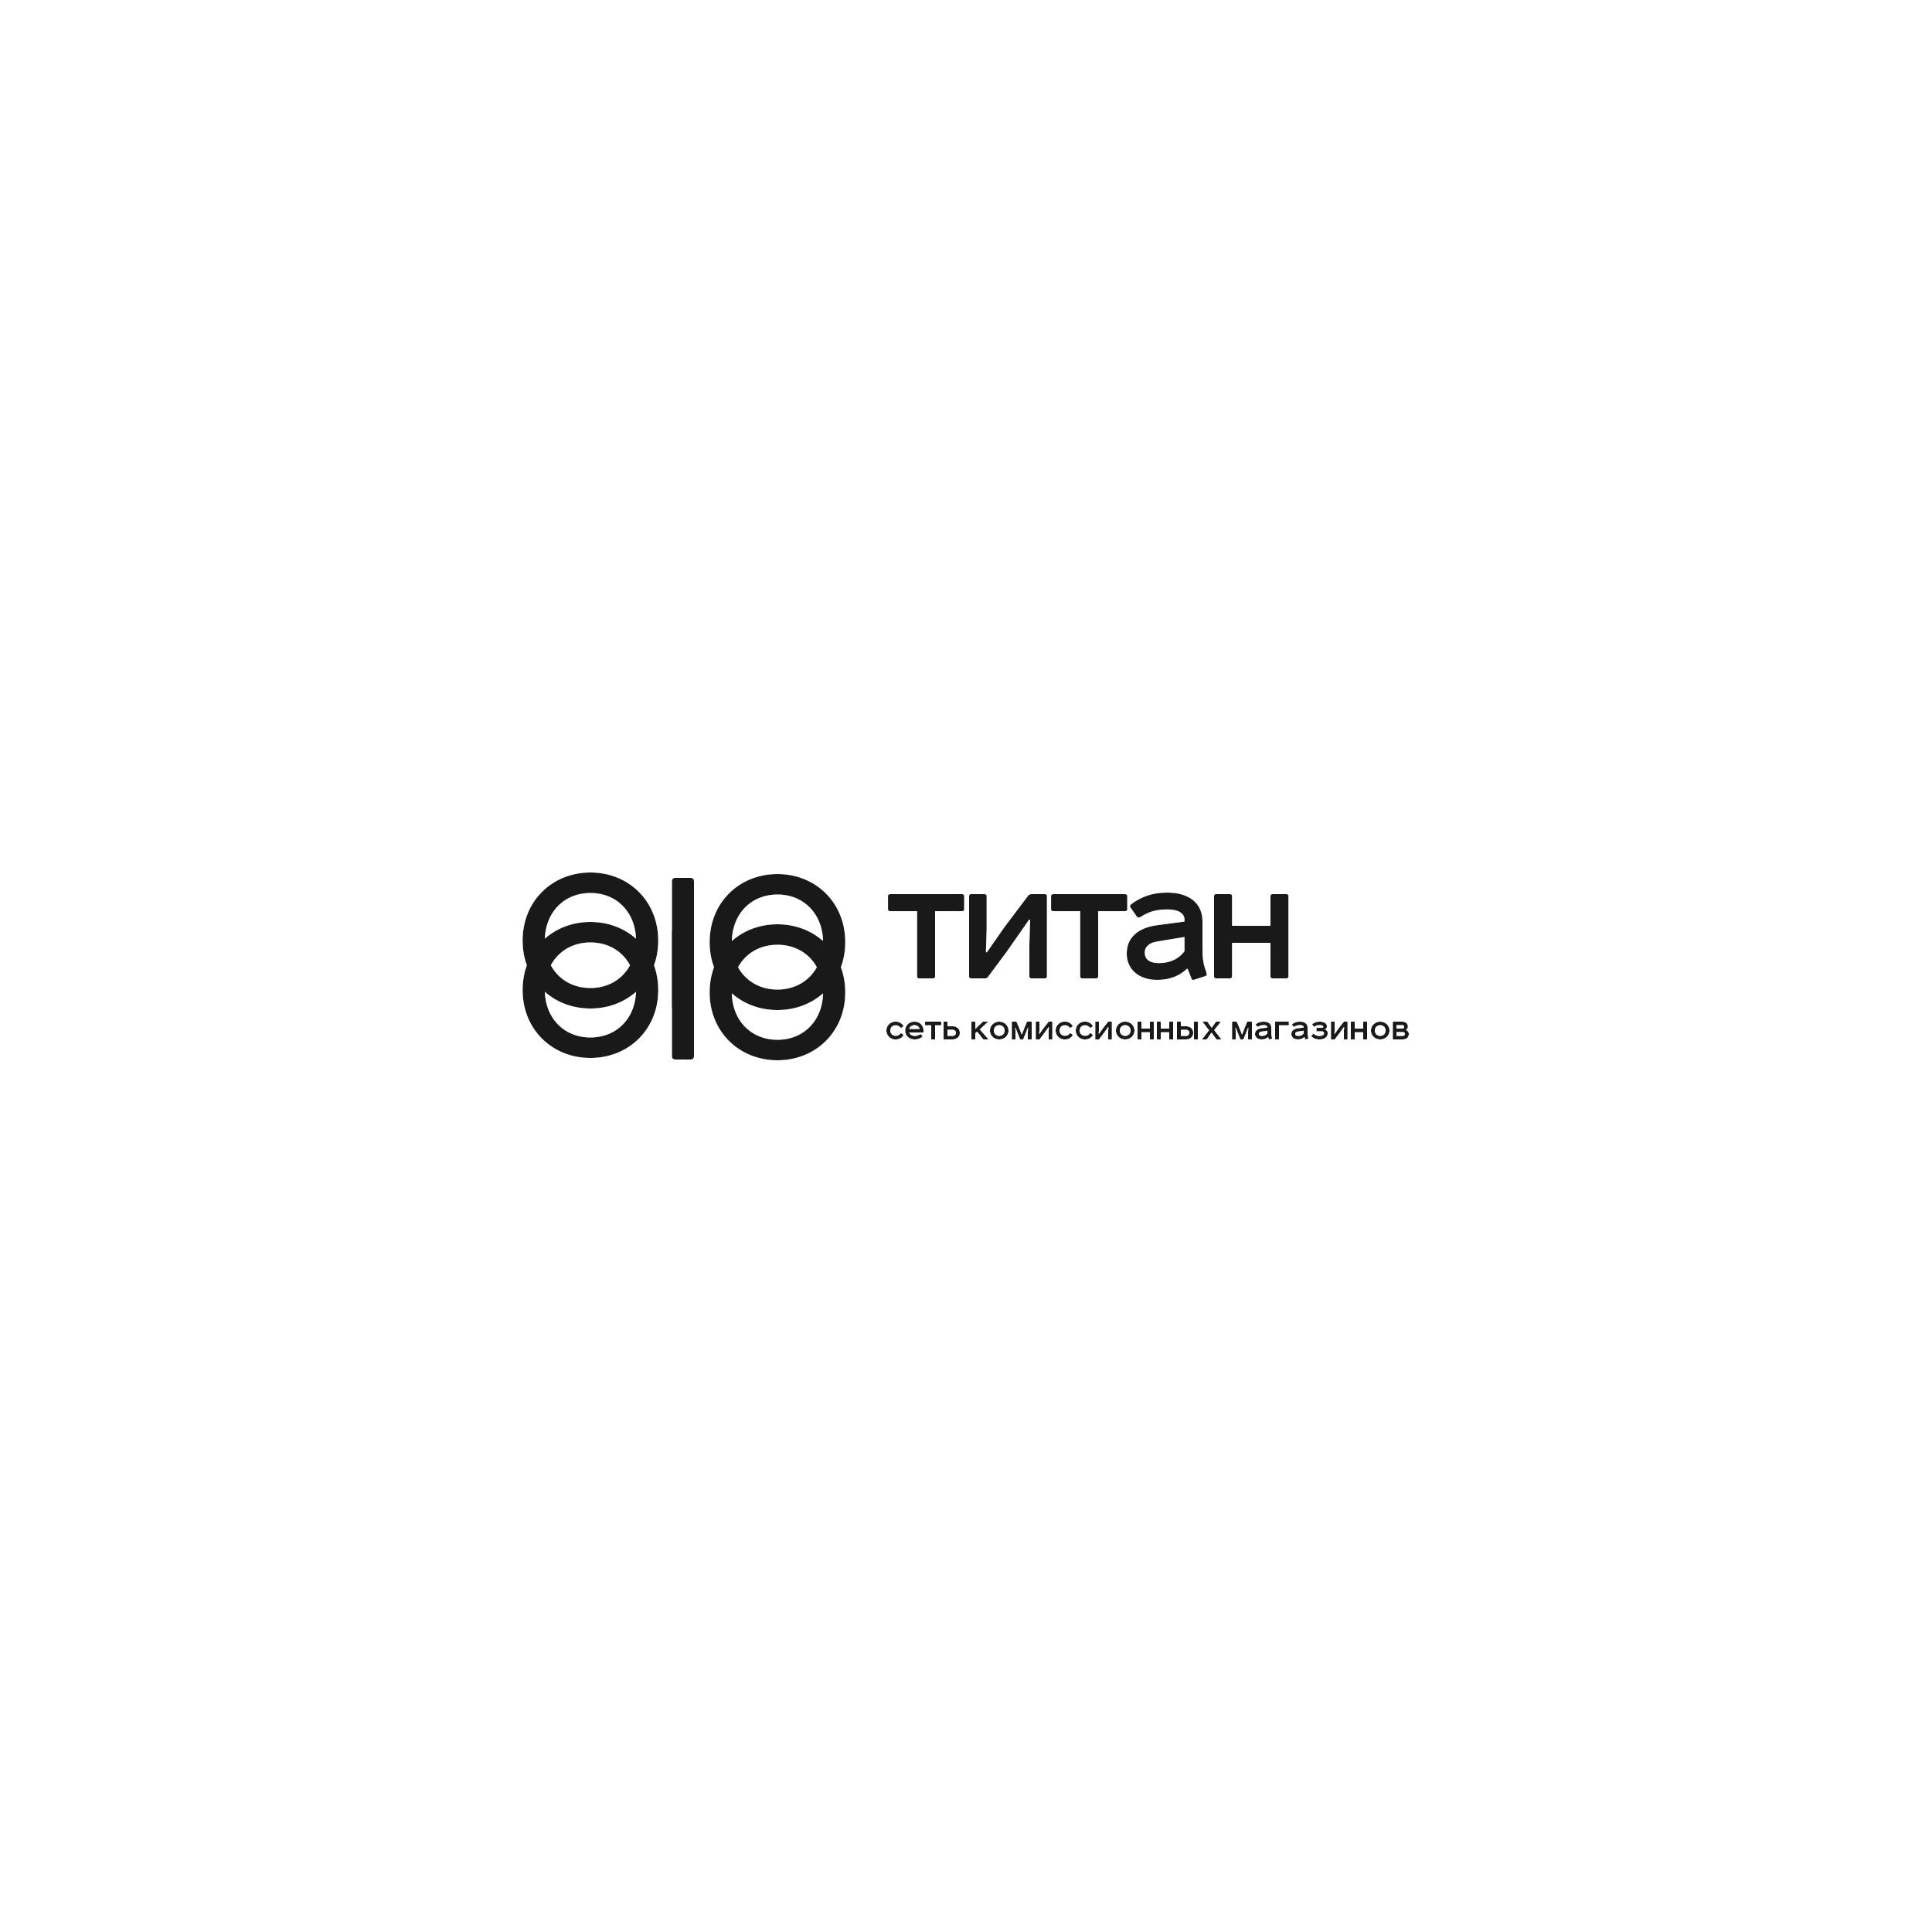 Разработка логотипа (срочно) фото f_3595d498ac6885b3.jpg